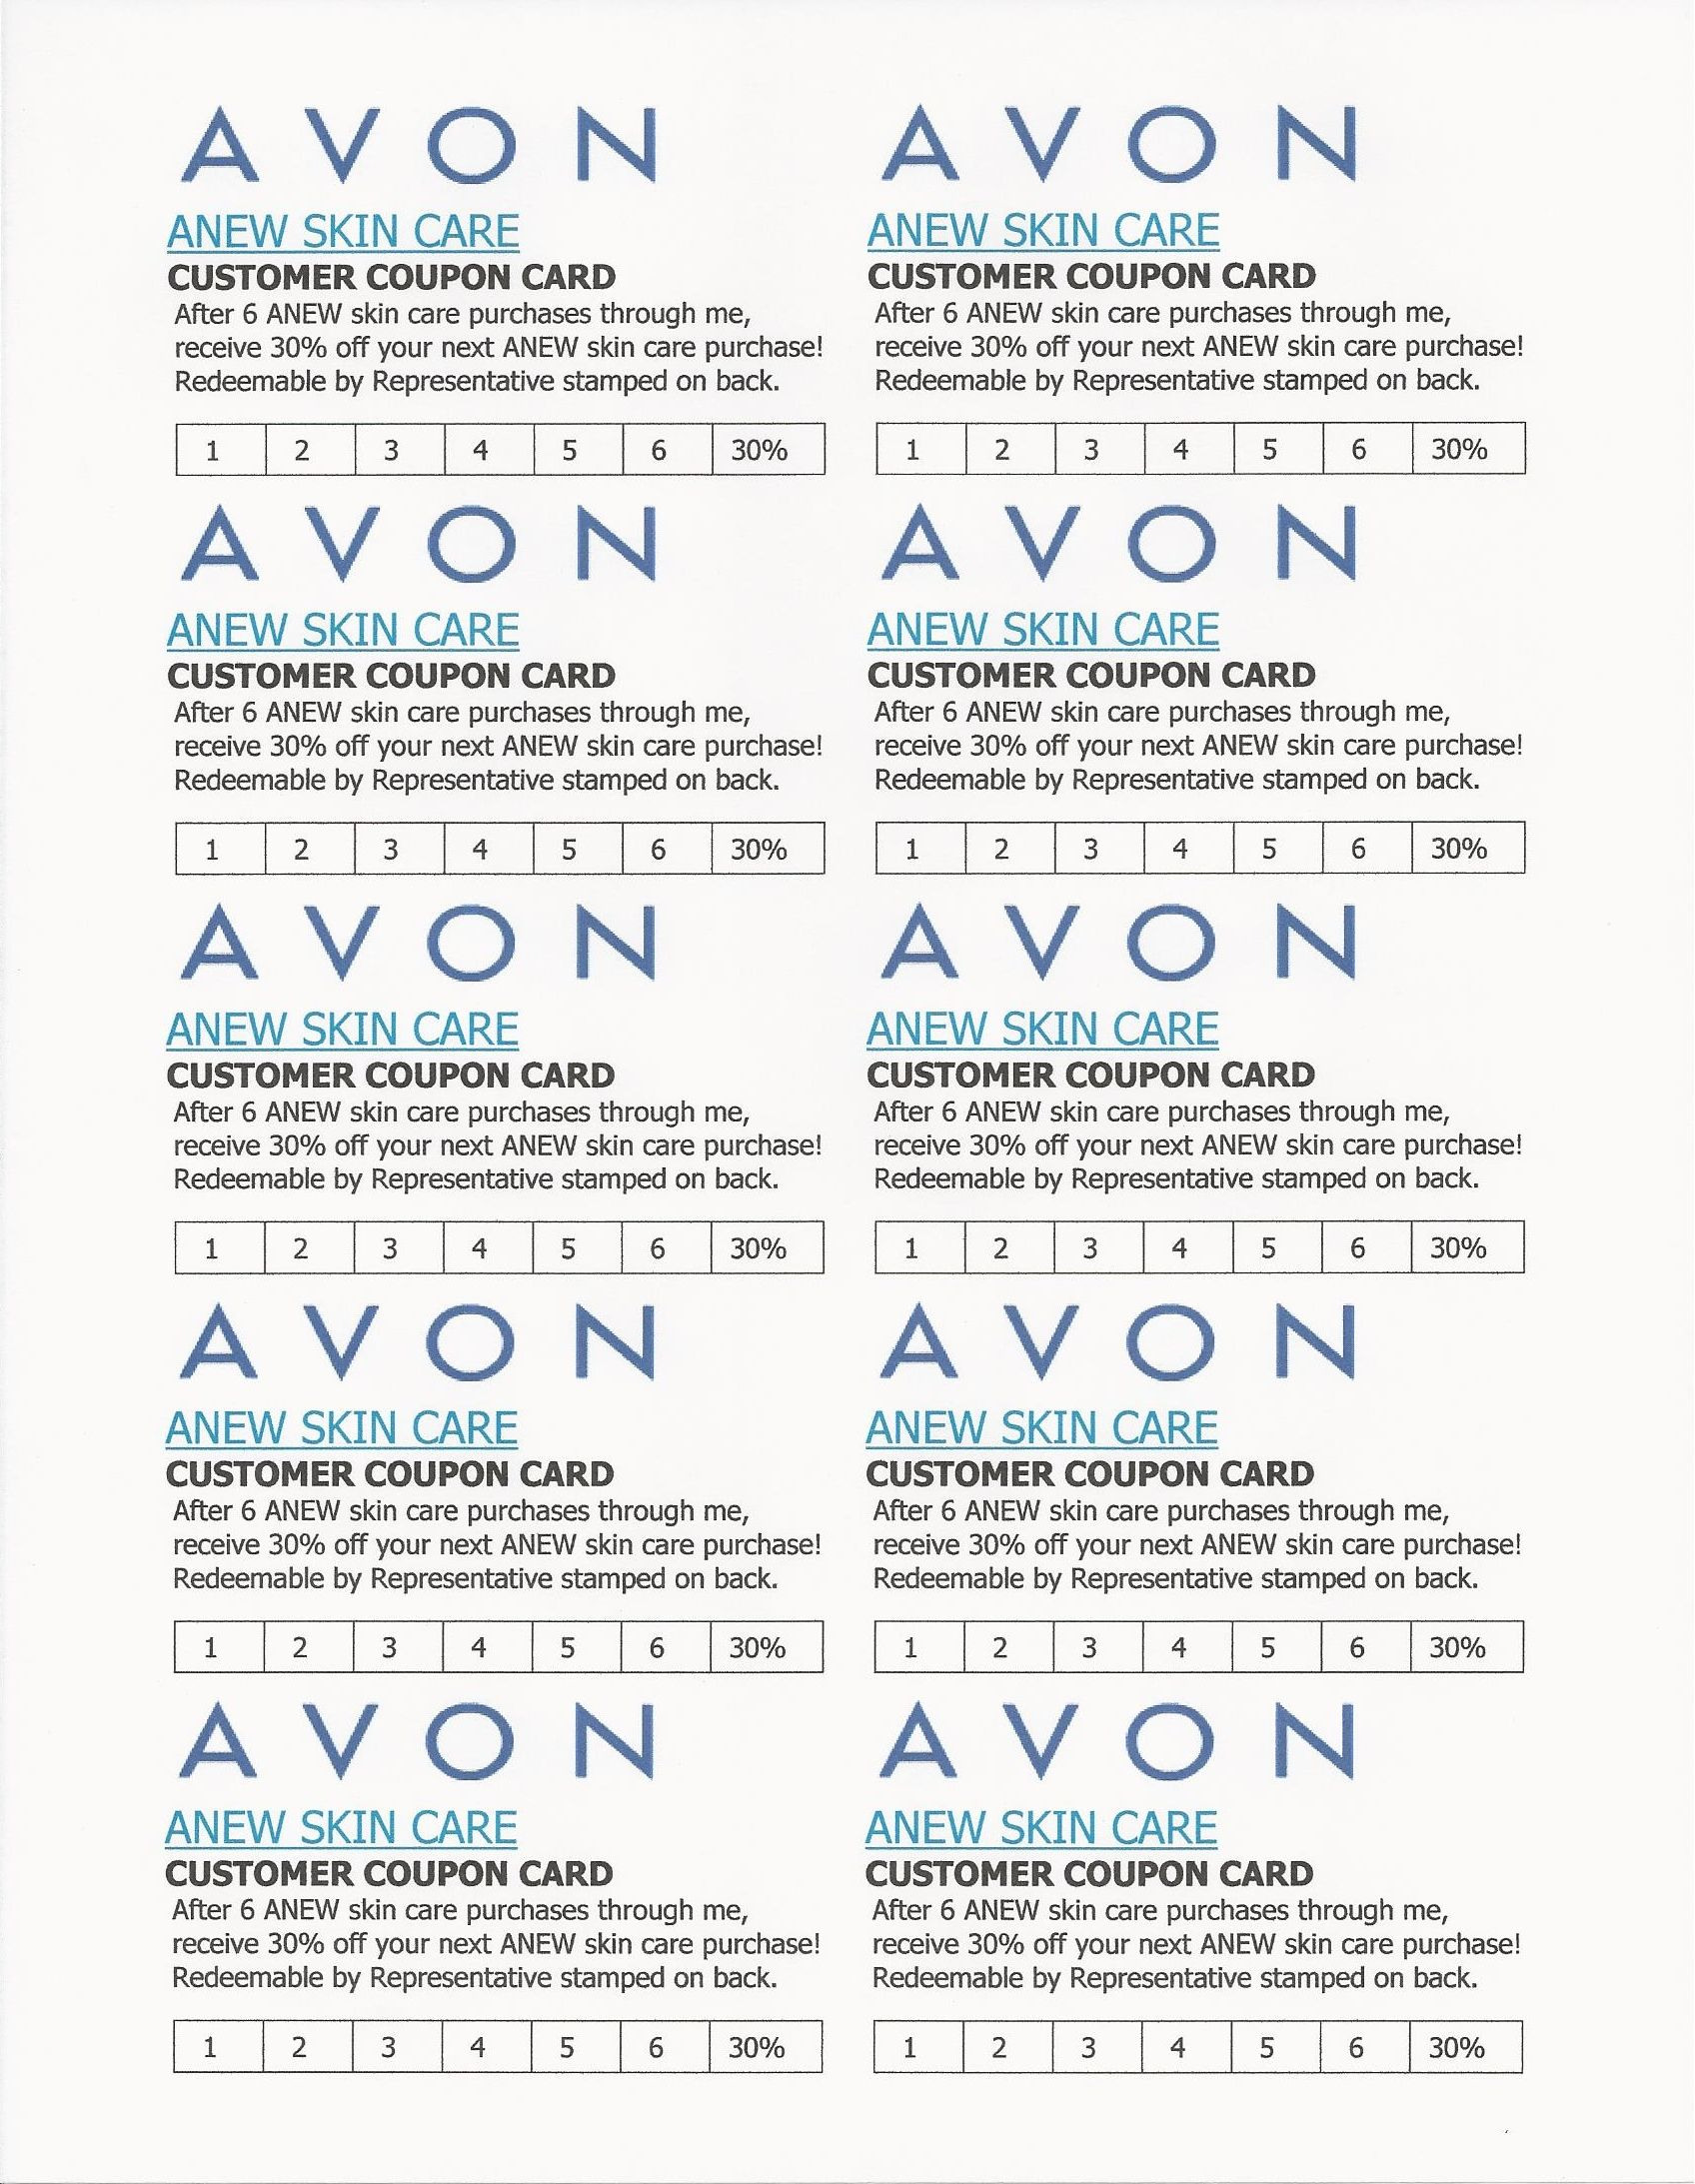 Avon flyers charts avon avon anew avon marketing